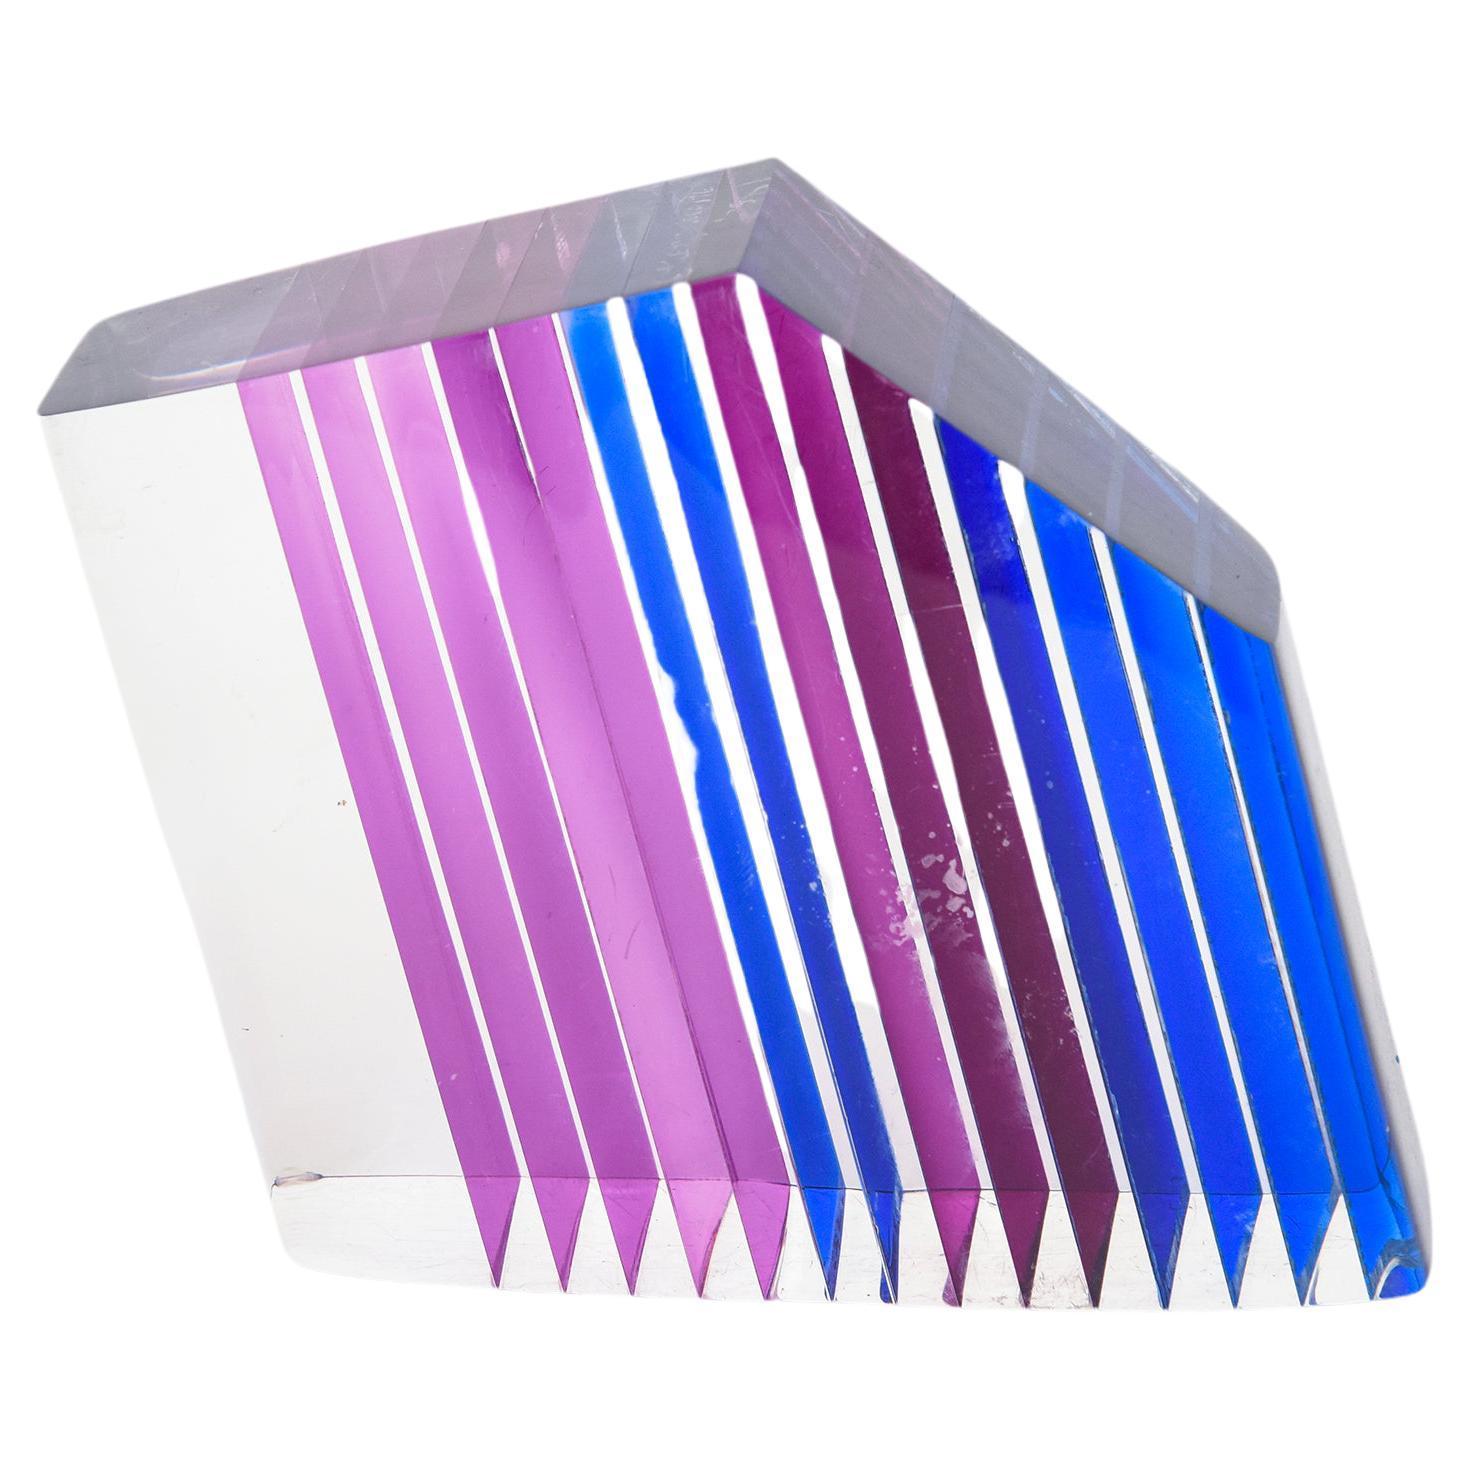 Lucite Purple, Blue, Pink, Angled Signed Lucite Sculpture Vintage Desk Accessory